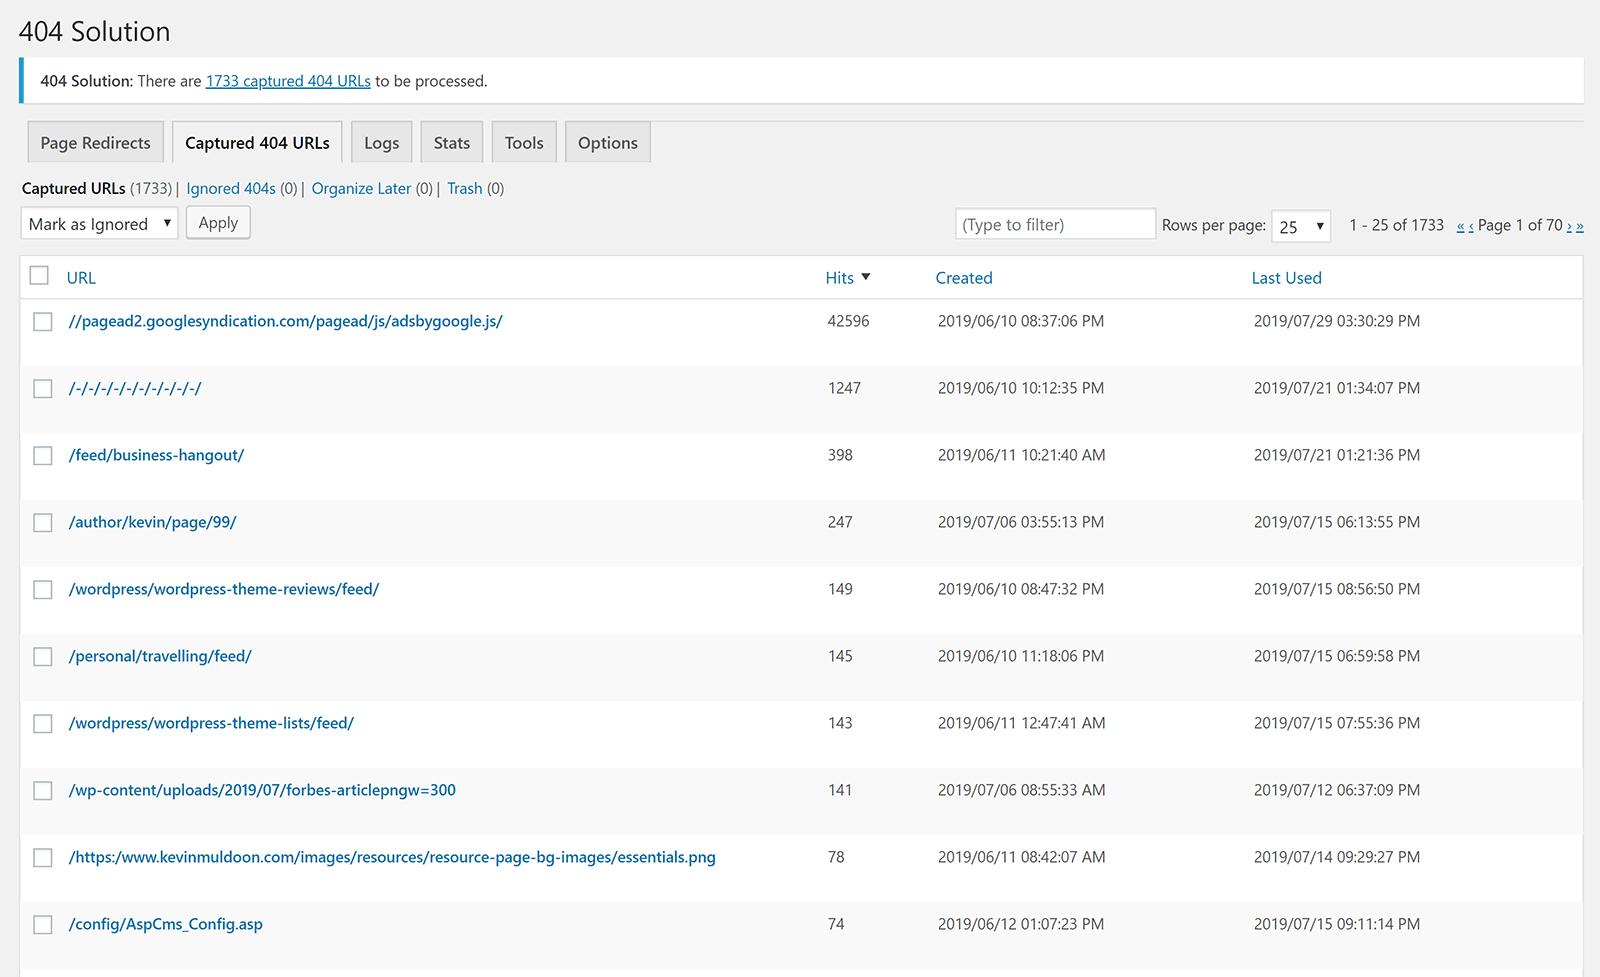 Captured 404 URLs